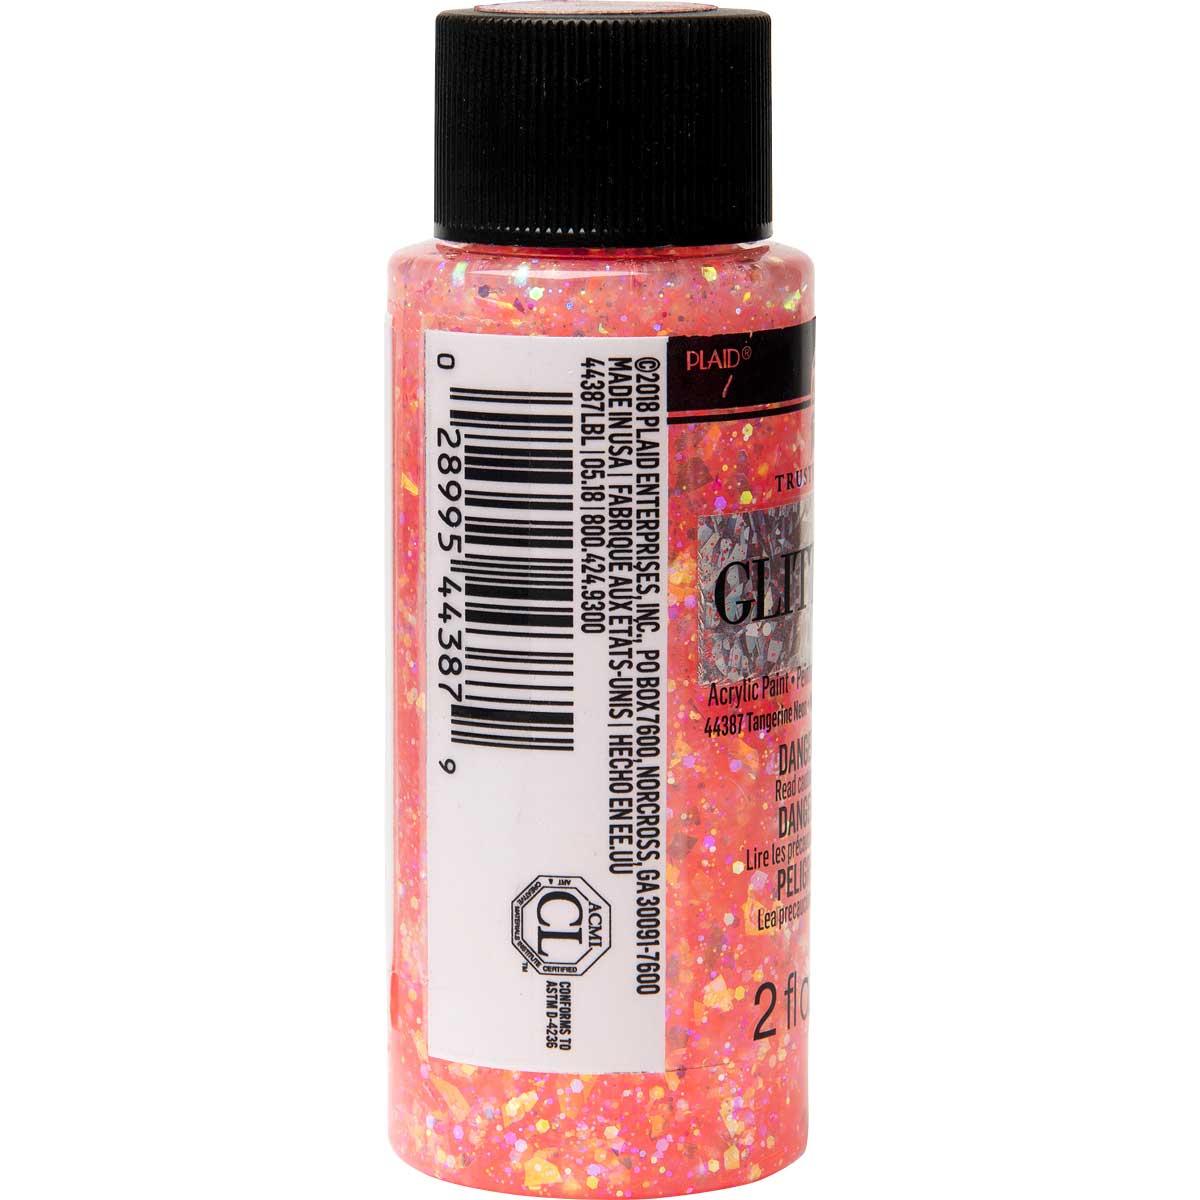 FolkArt ® Glitterific™ Acrylic Paint - Neon Tangerine, 2 oz.